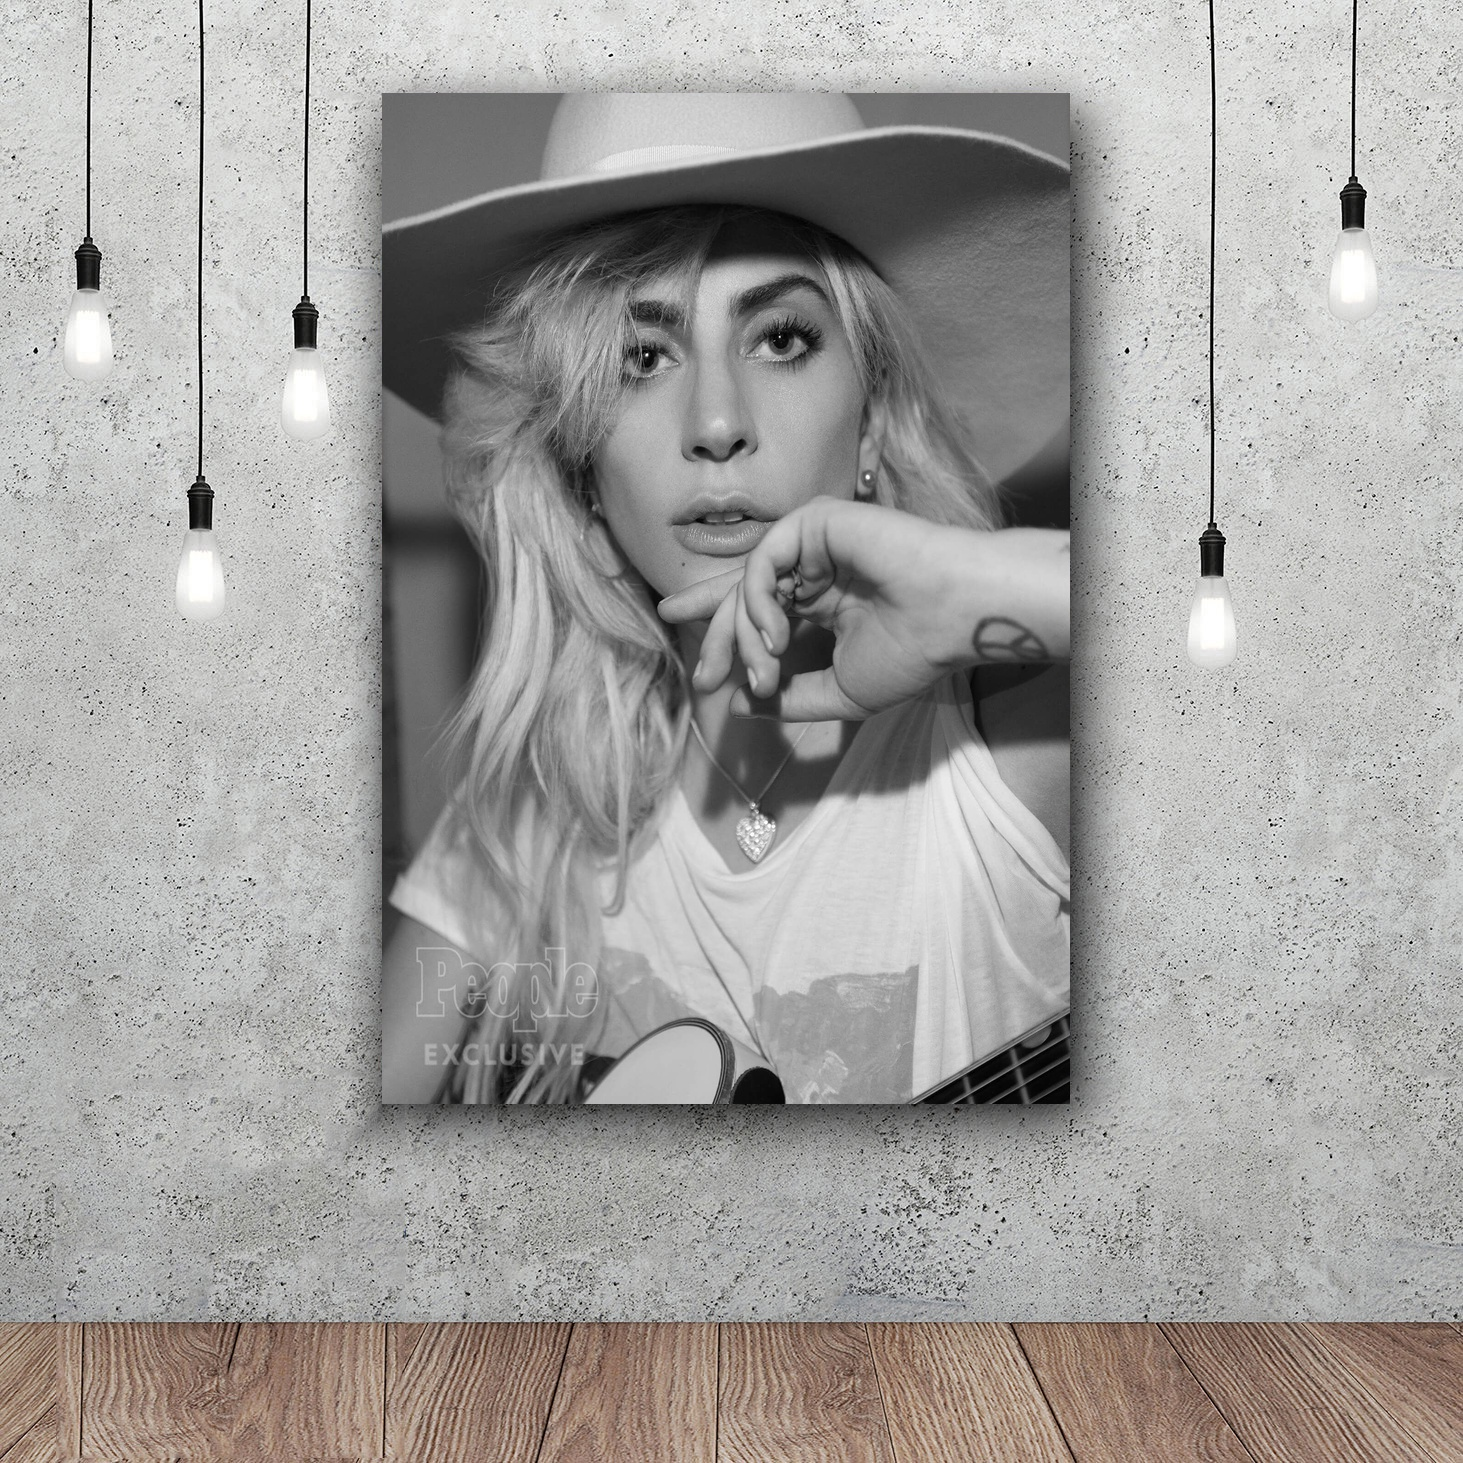 C1815 Lady Gaga Joanne World Tour 2017 Music Art Silk Poster 20x30 24x36inch